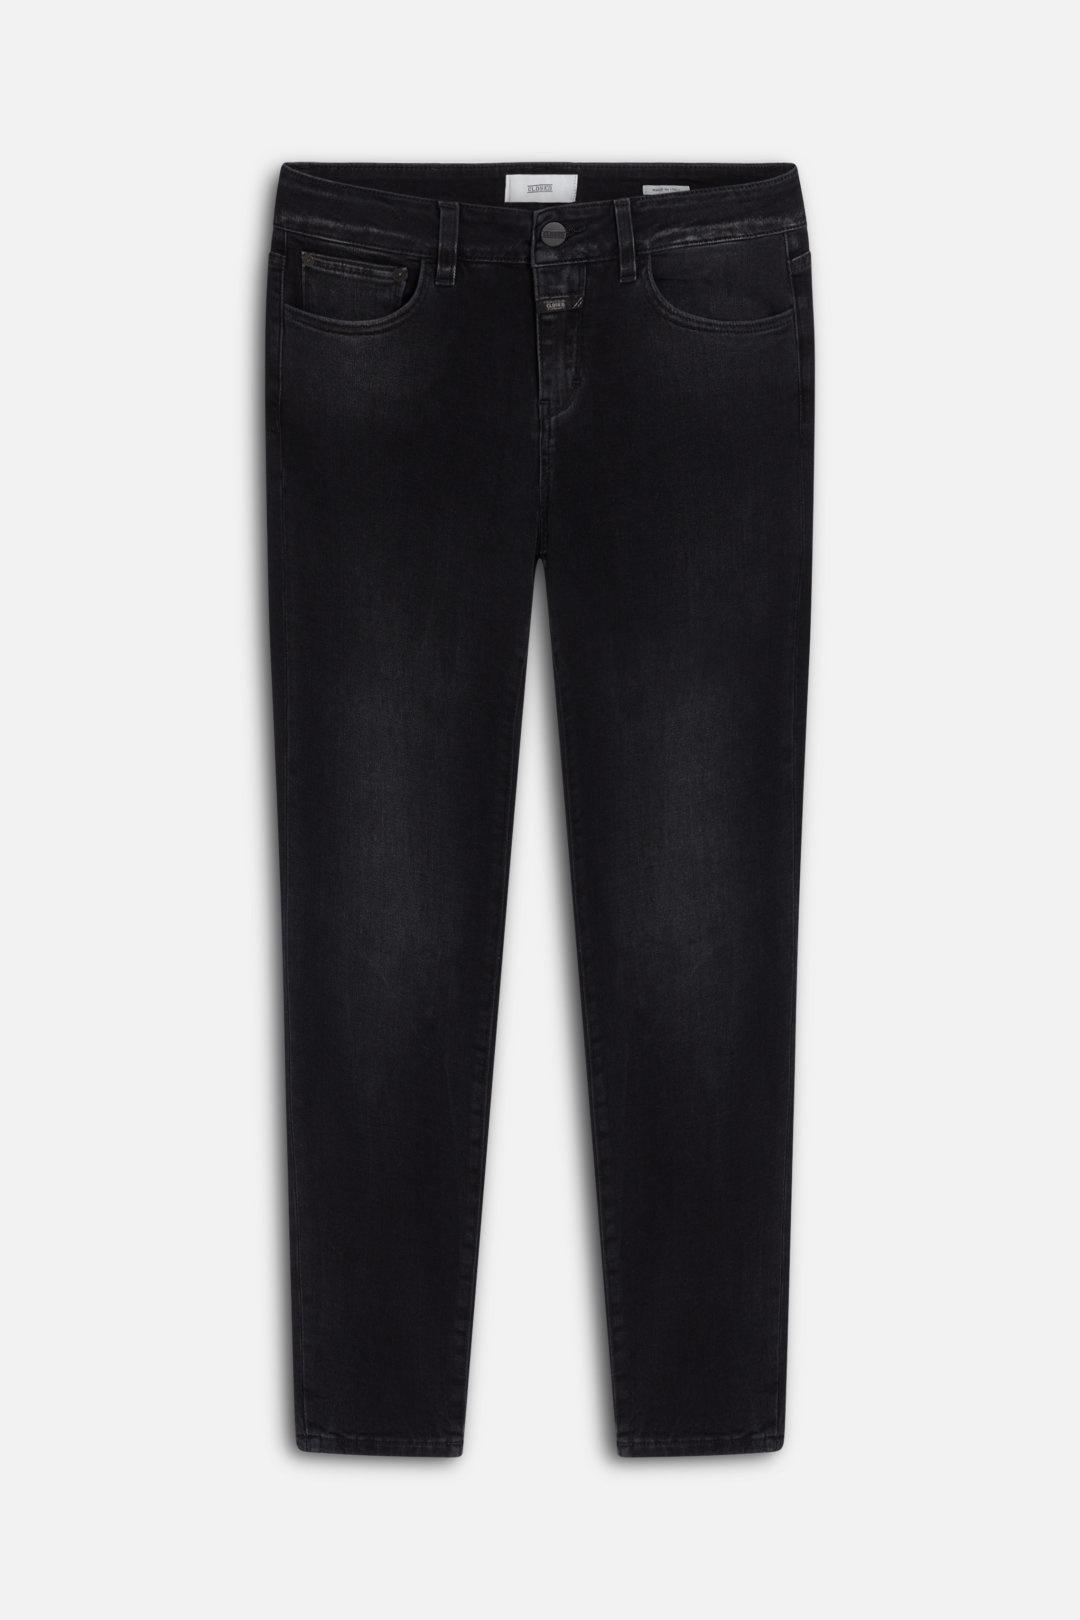 Closed Jeans C91833 03Z 3E-1